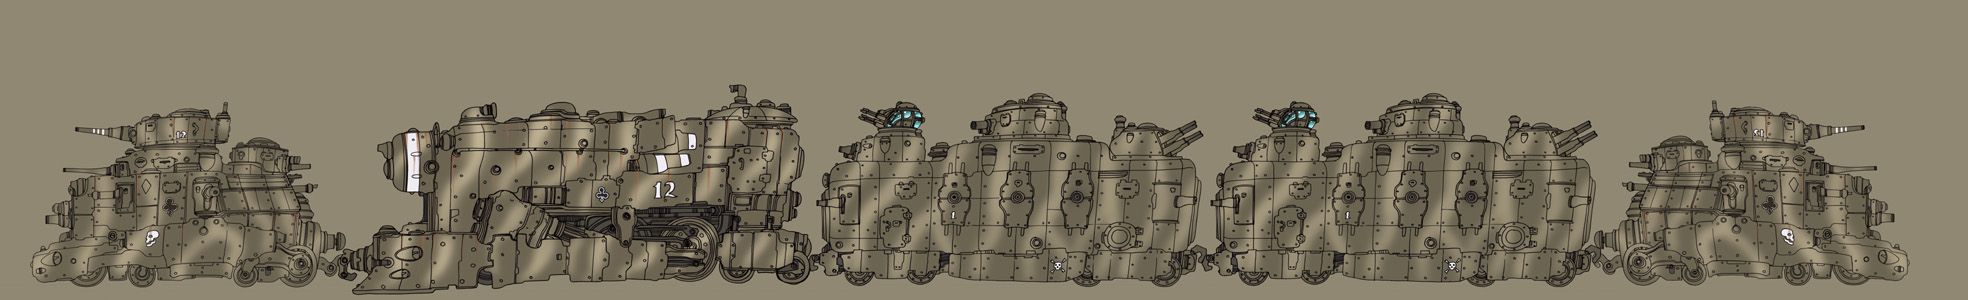 Armoured Train by spacegoblin